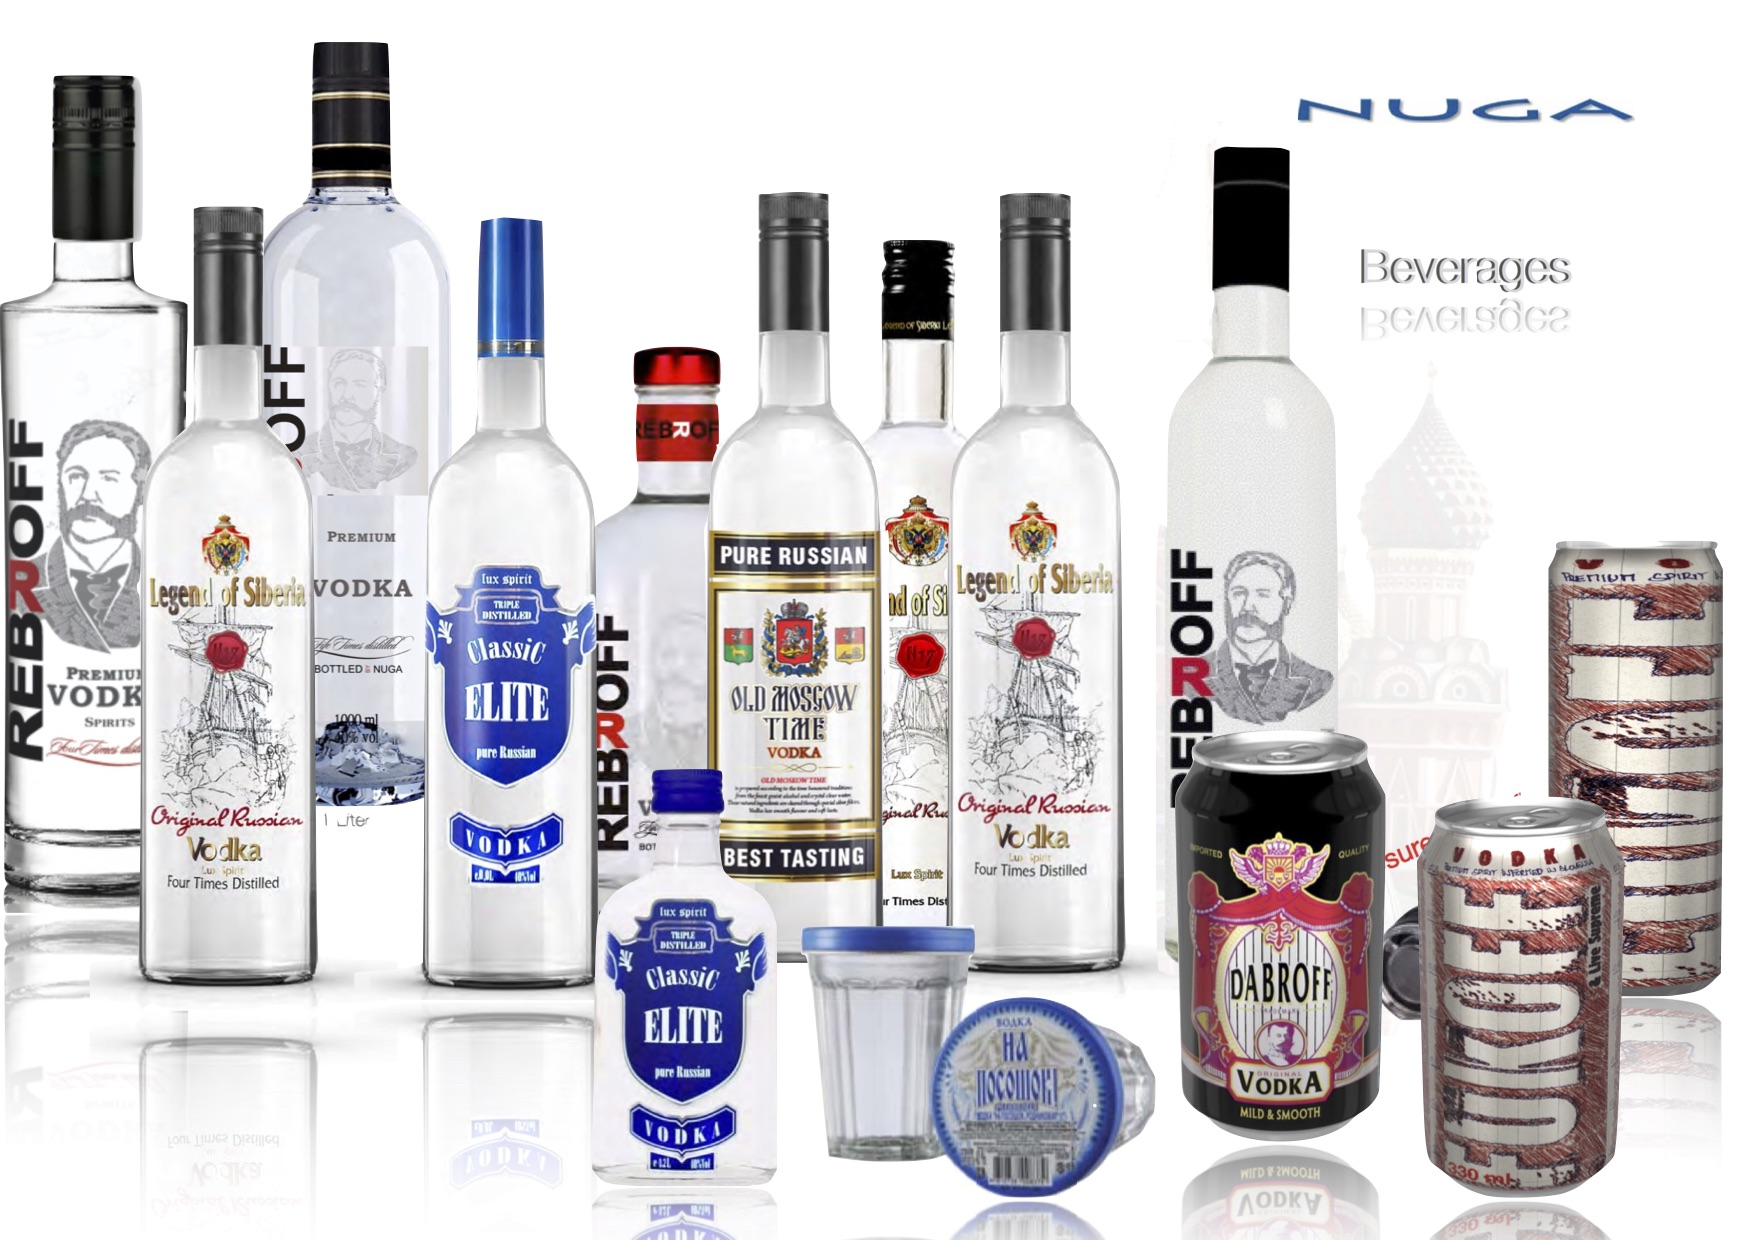 Super Premium Vodka - Russian Super Premium Vodka in cans and soft bags